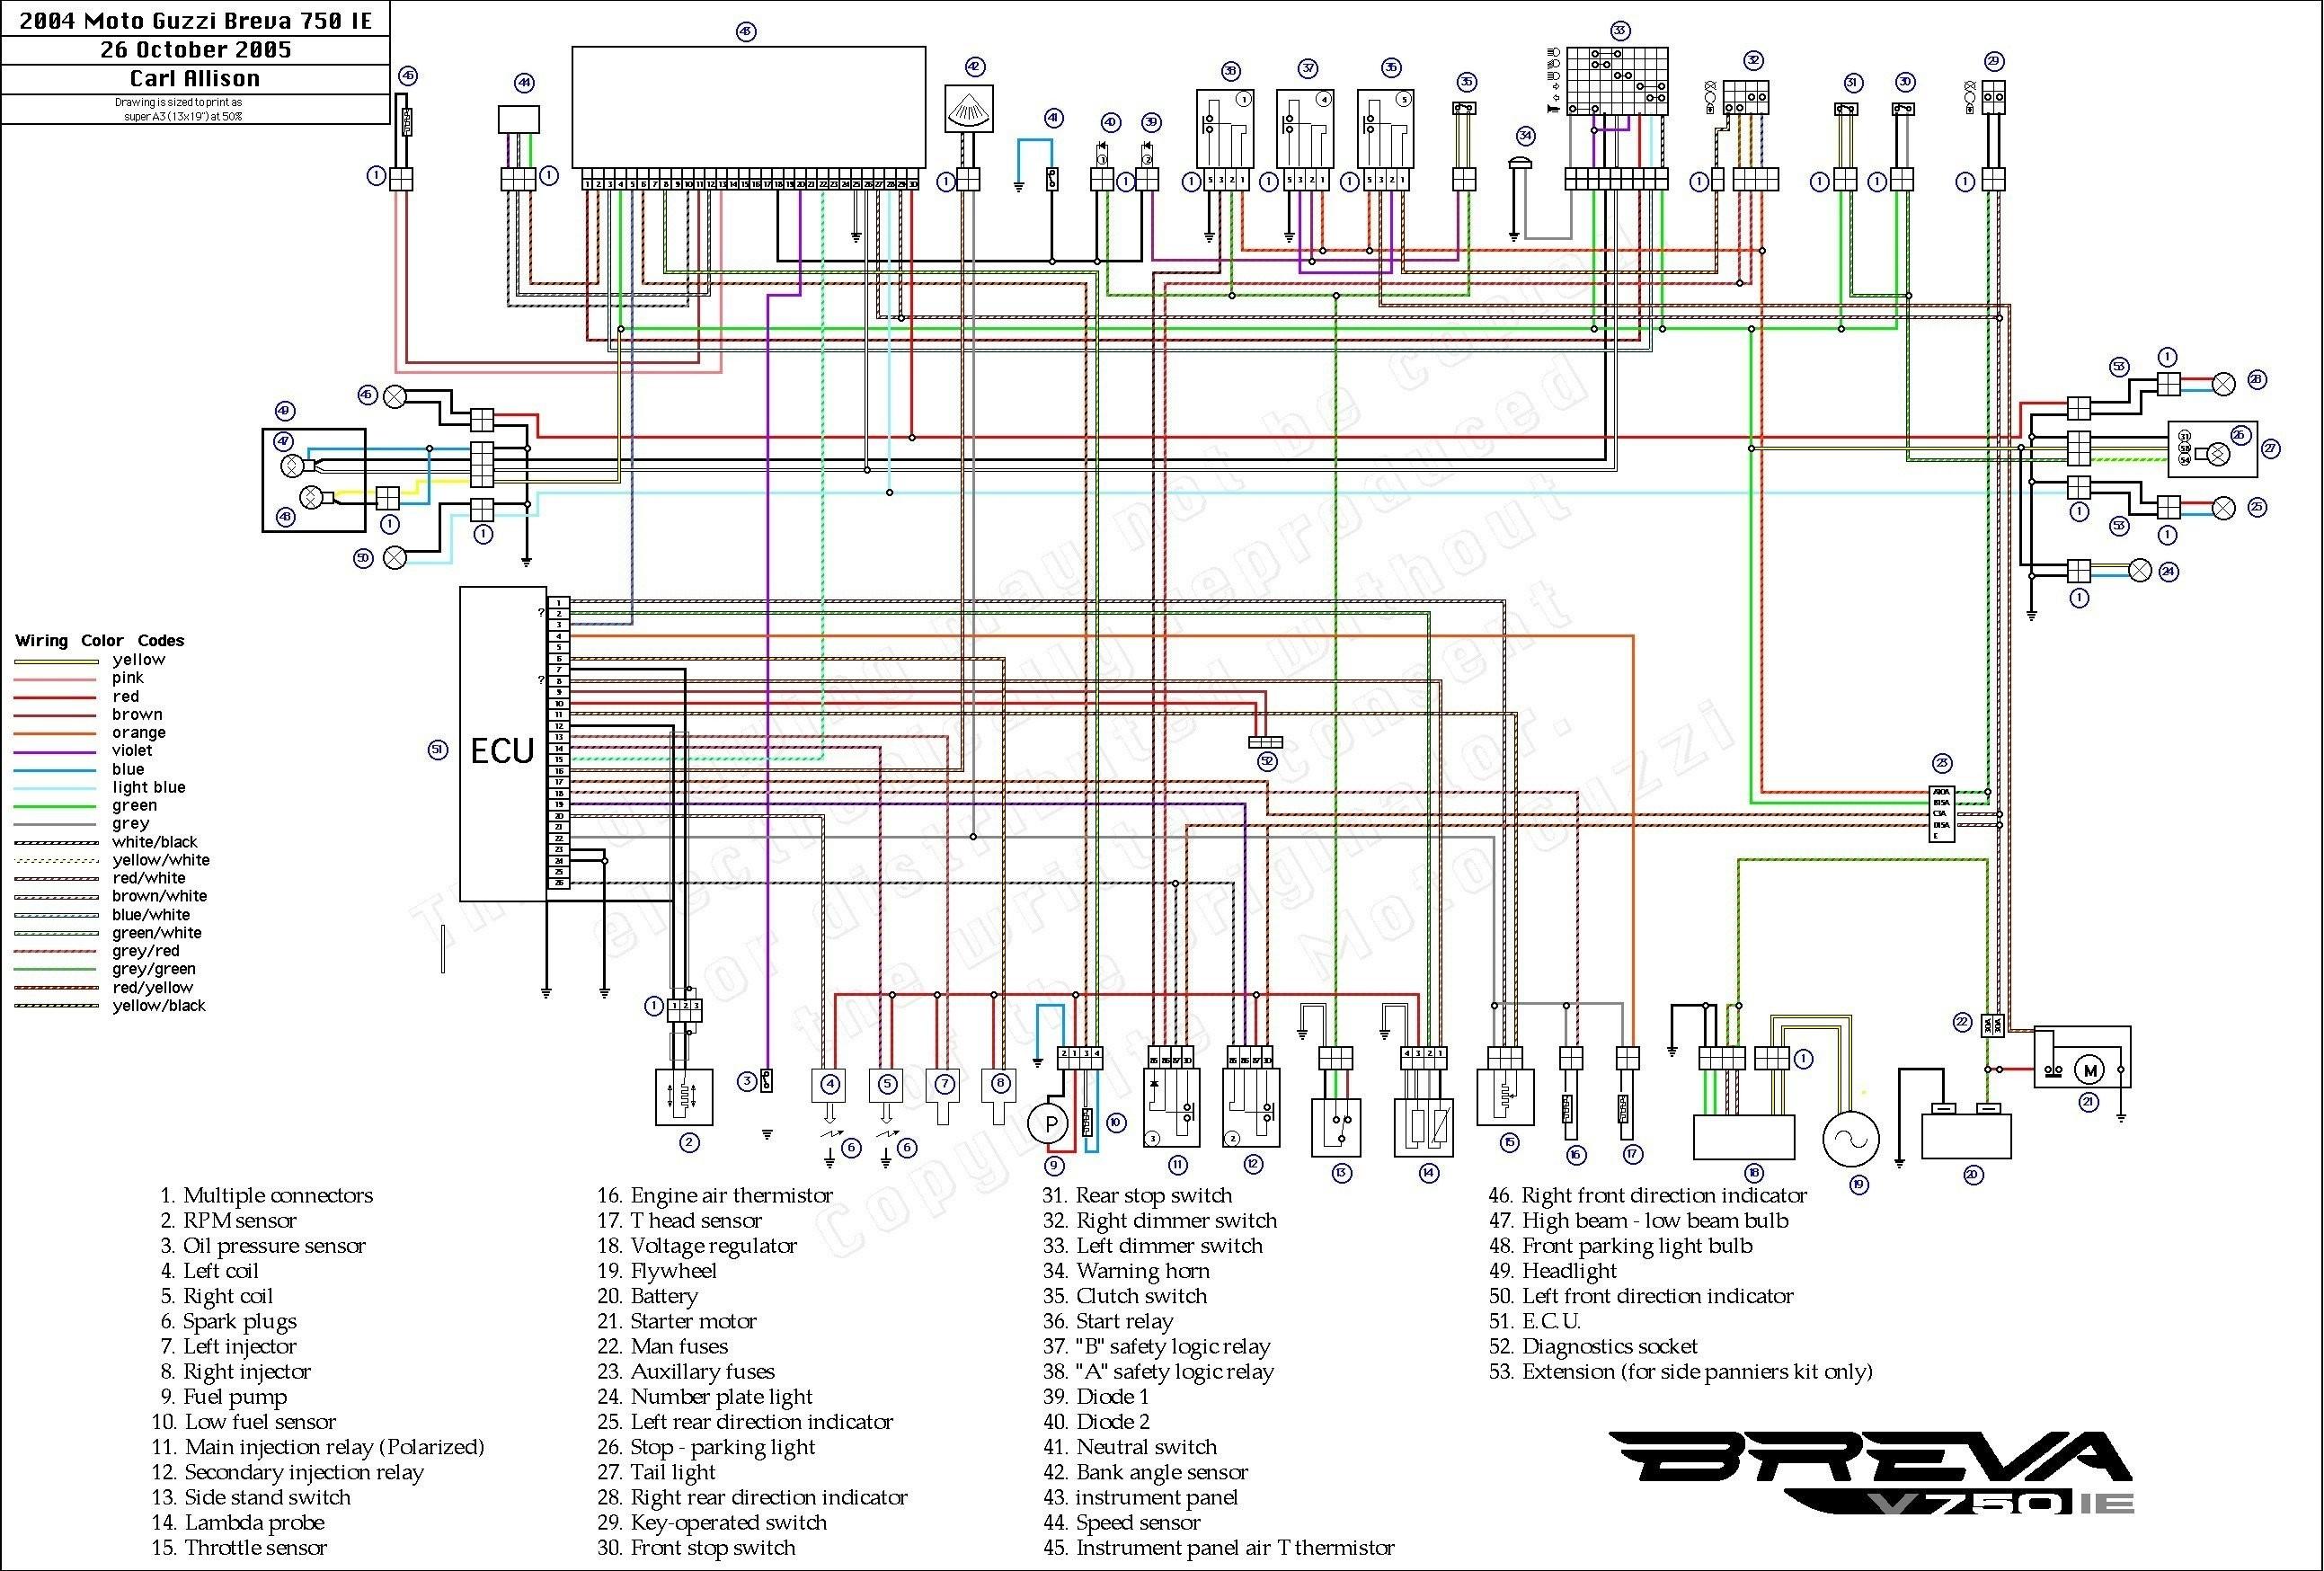 2004 Dodge Ram 1500 Engine Diagram 2005 Dodge Ram 1500 Ignition Switch Wiring Diagram Experts Of 2004 Dodge Ram 1500 Engine Diagram